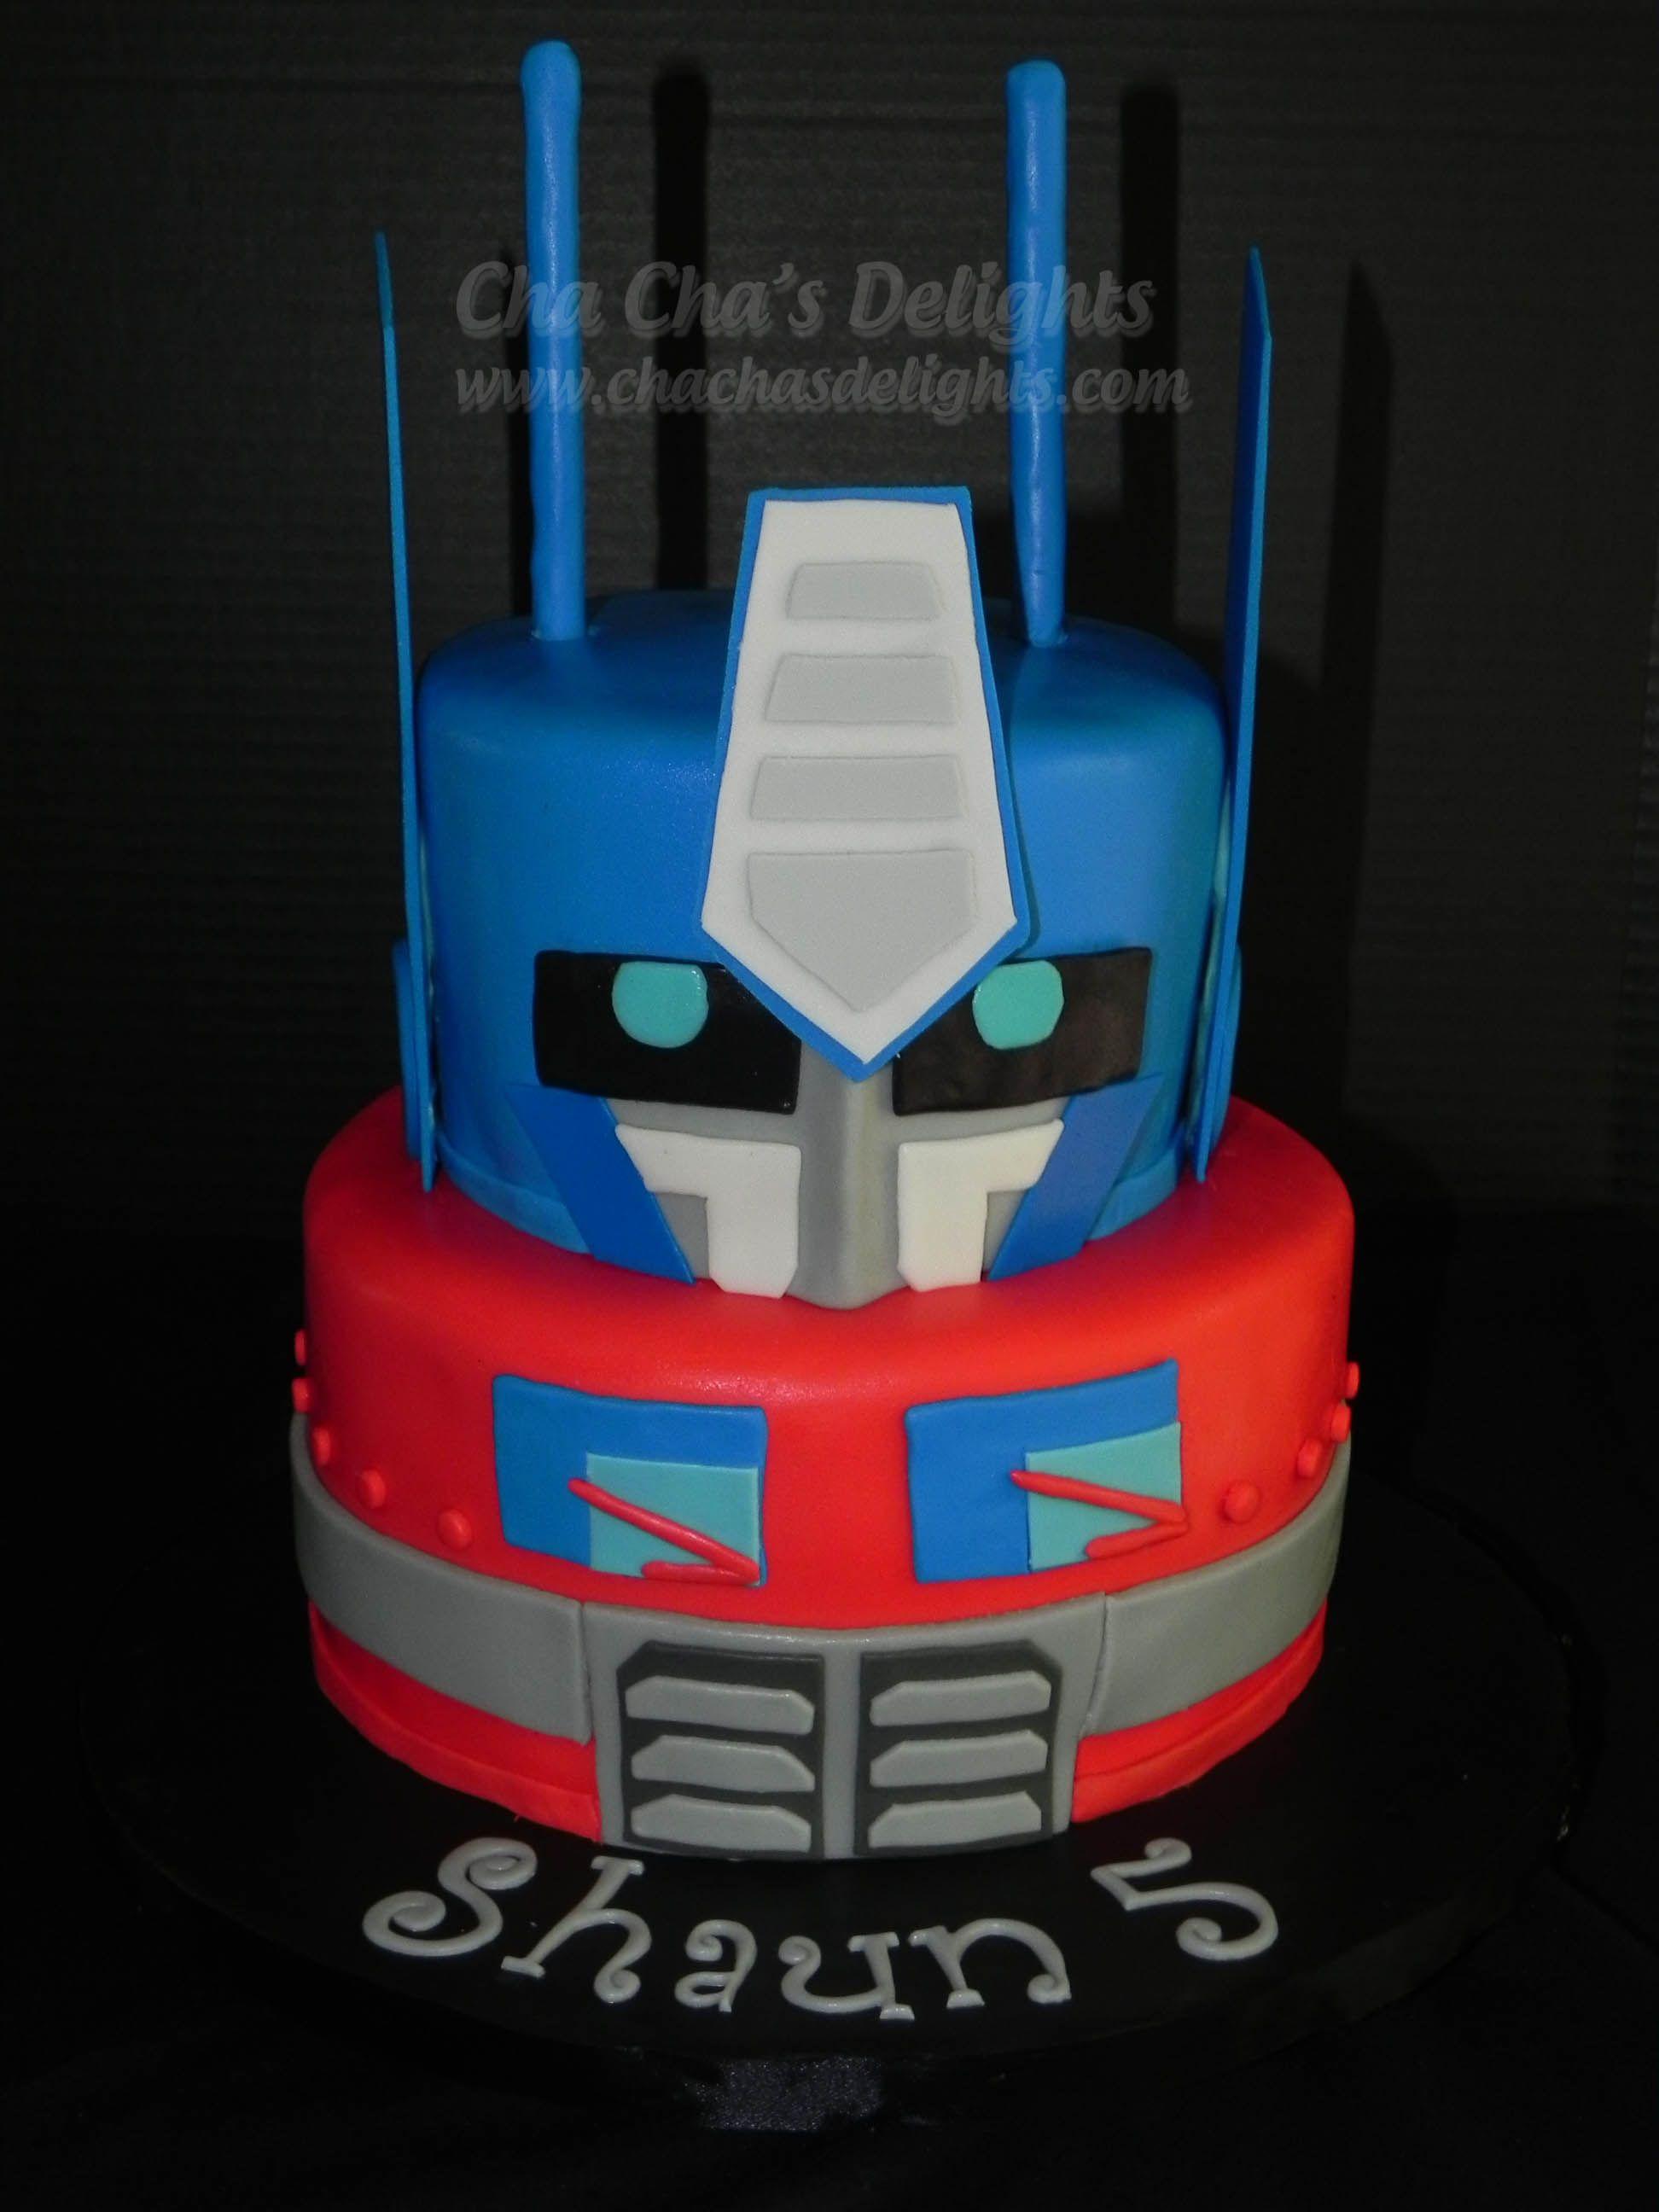 Optimus Prime Transformer Cake Vanilla Cake Wchocolate Filling